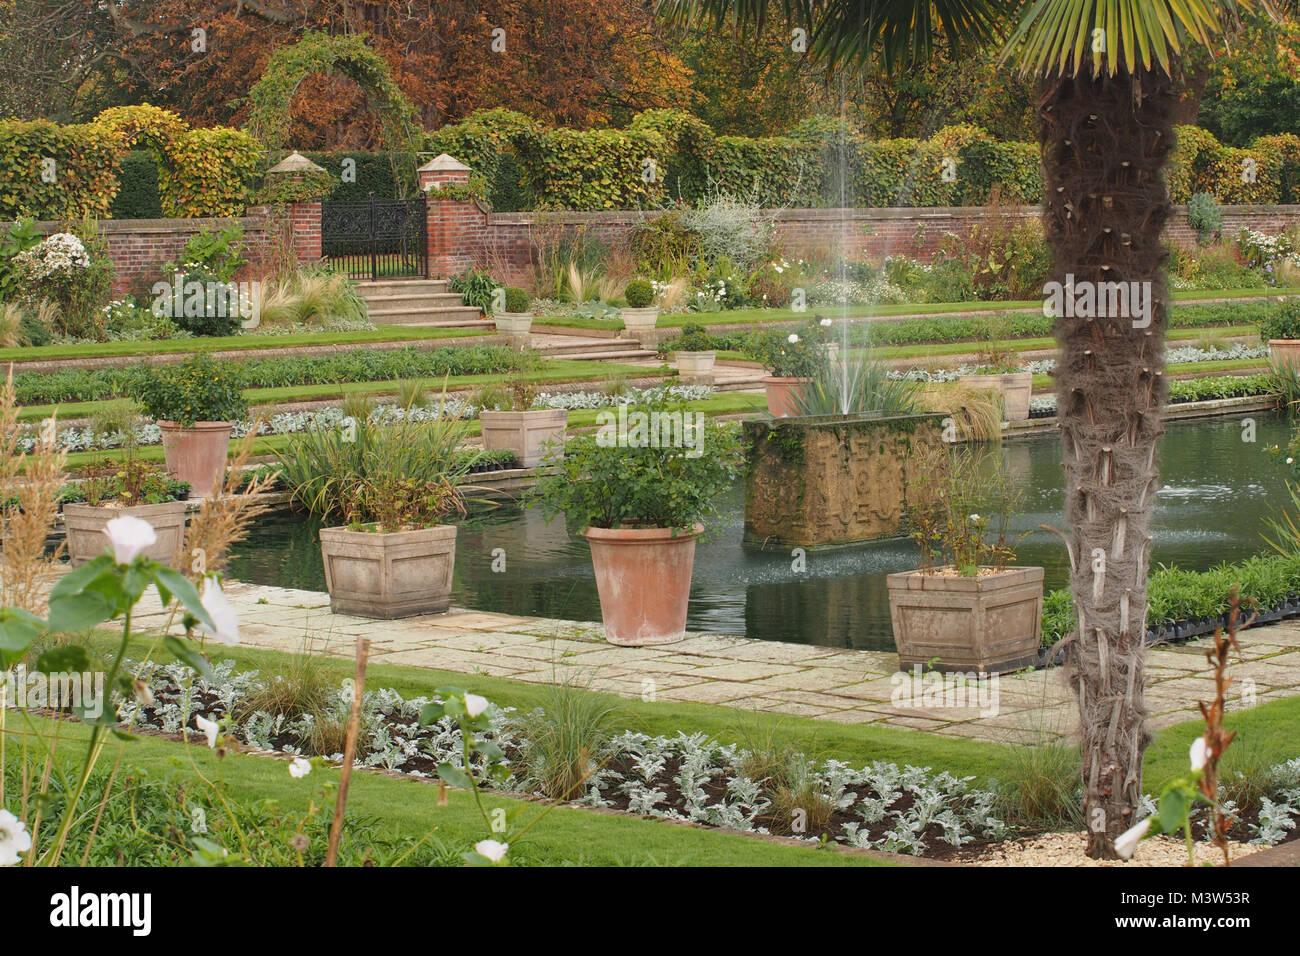 The walled, terraced, sunken garden at Kensington Palace, London Stock Photo